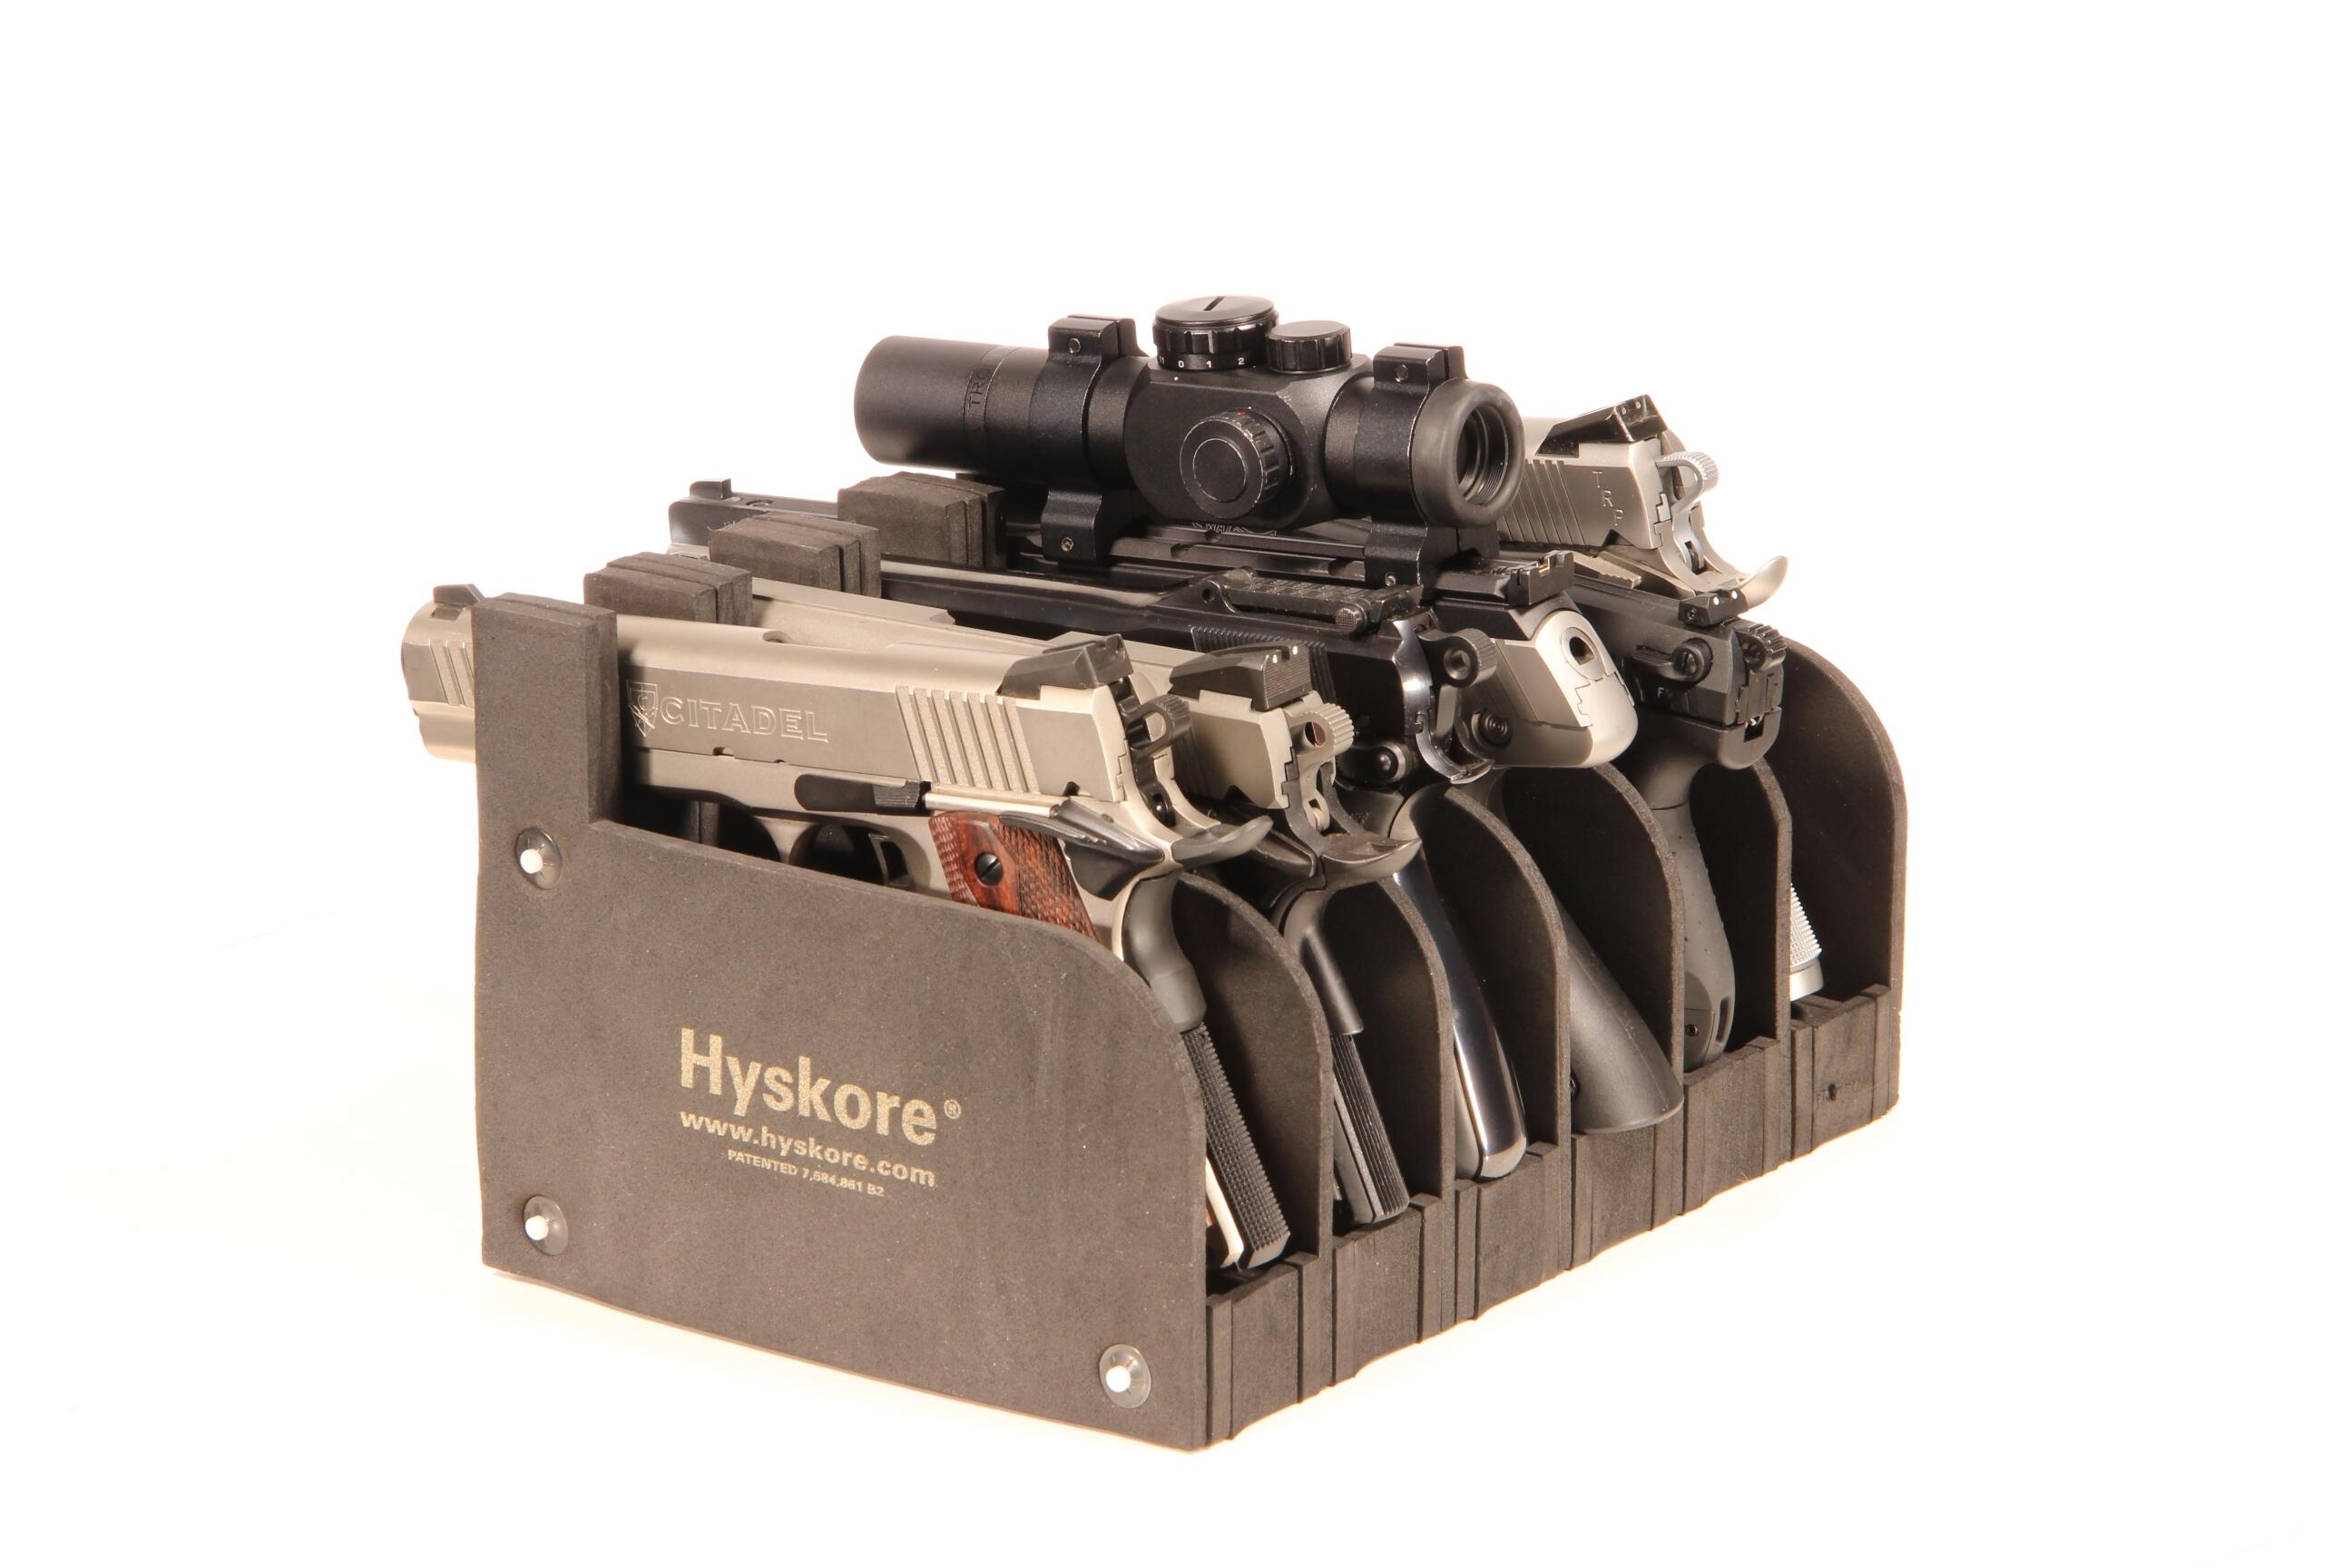 Hyskore Professional Shooting Accessories 30277 6 Gun Pistol Rack